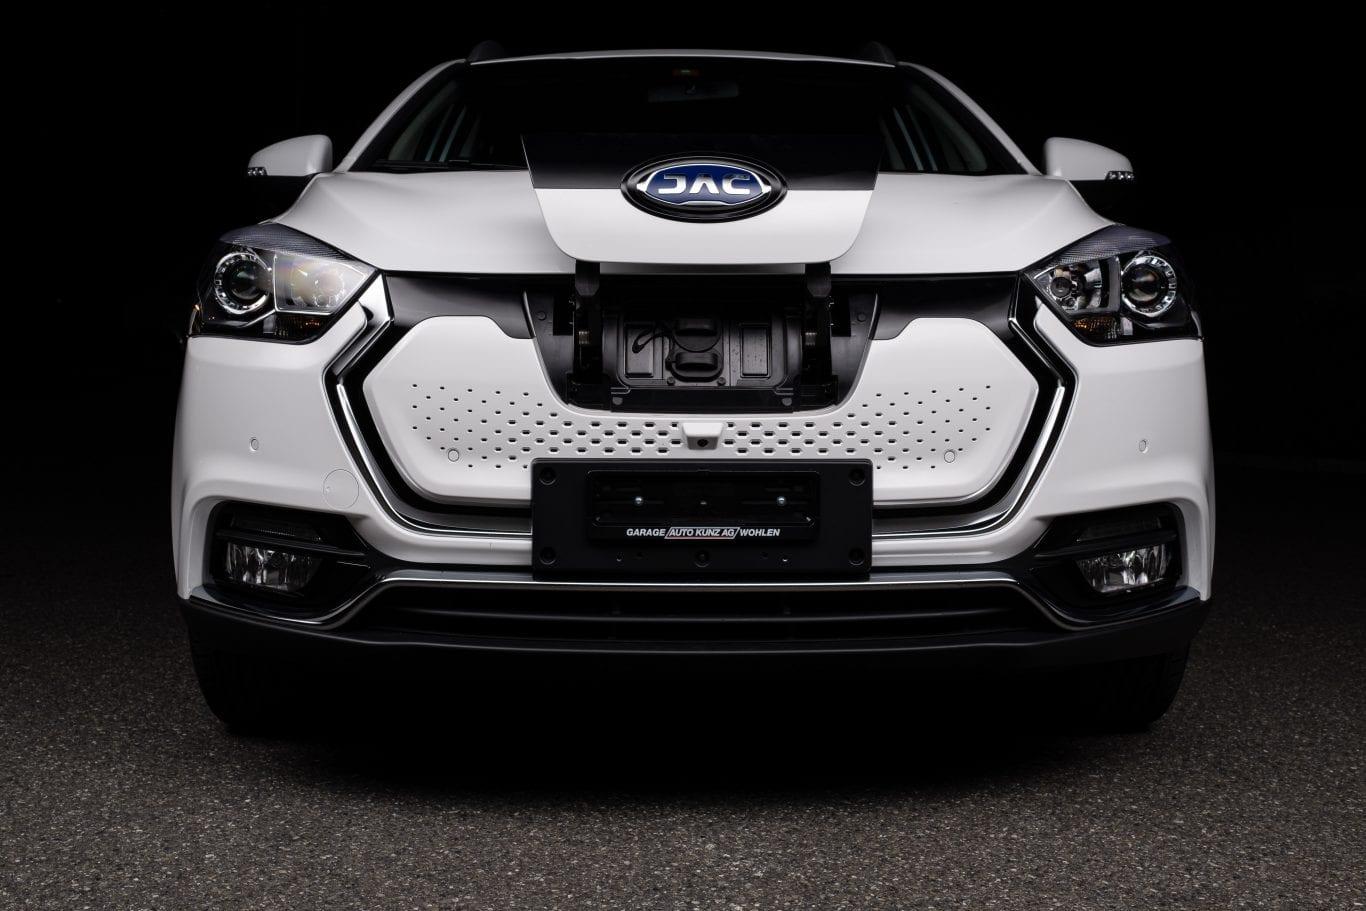 JAC – Auto Kunz ist offiziell neuer Generalimporteur - Auto Kunz AG 8